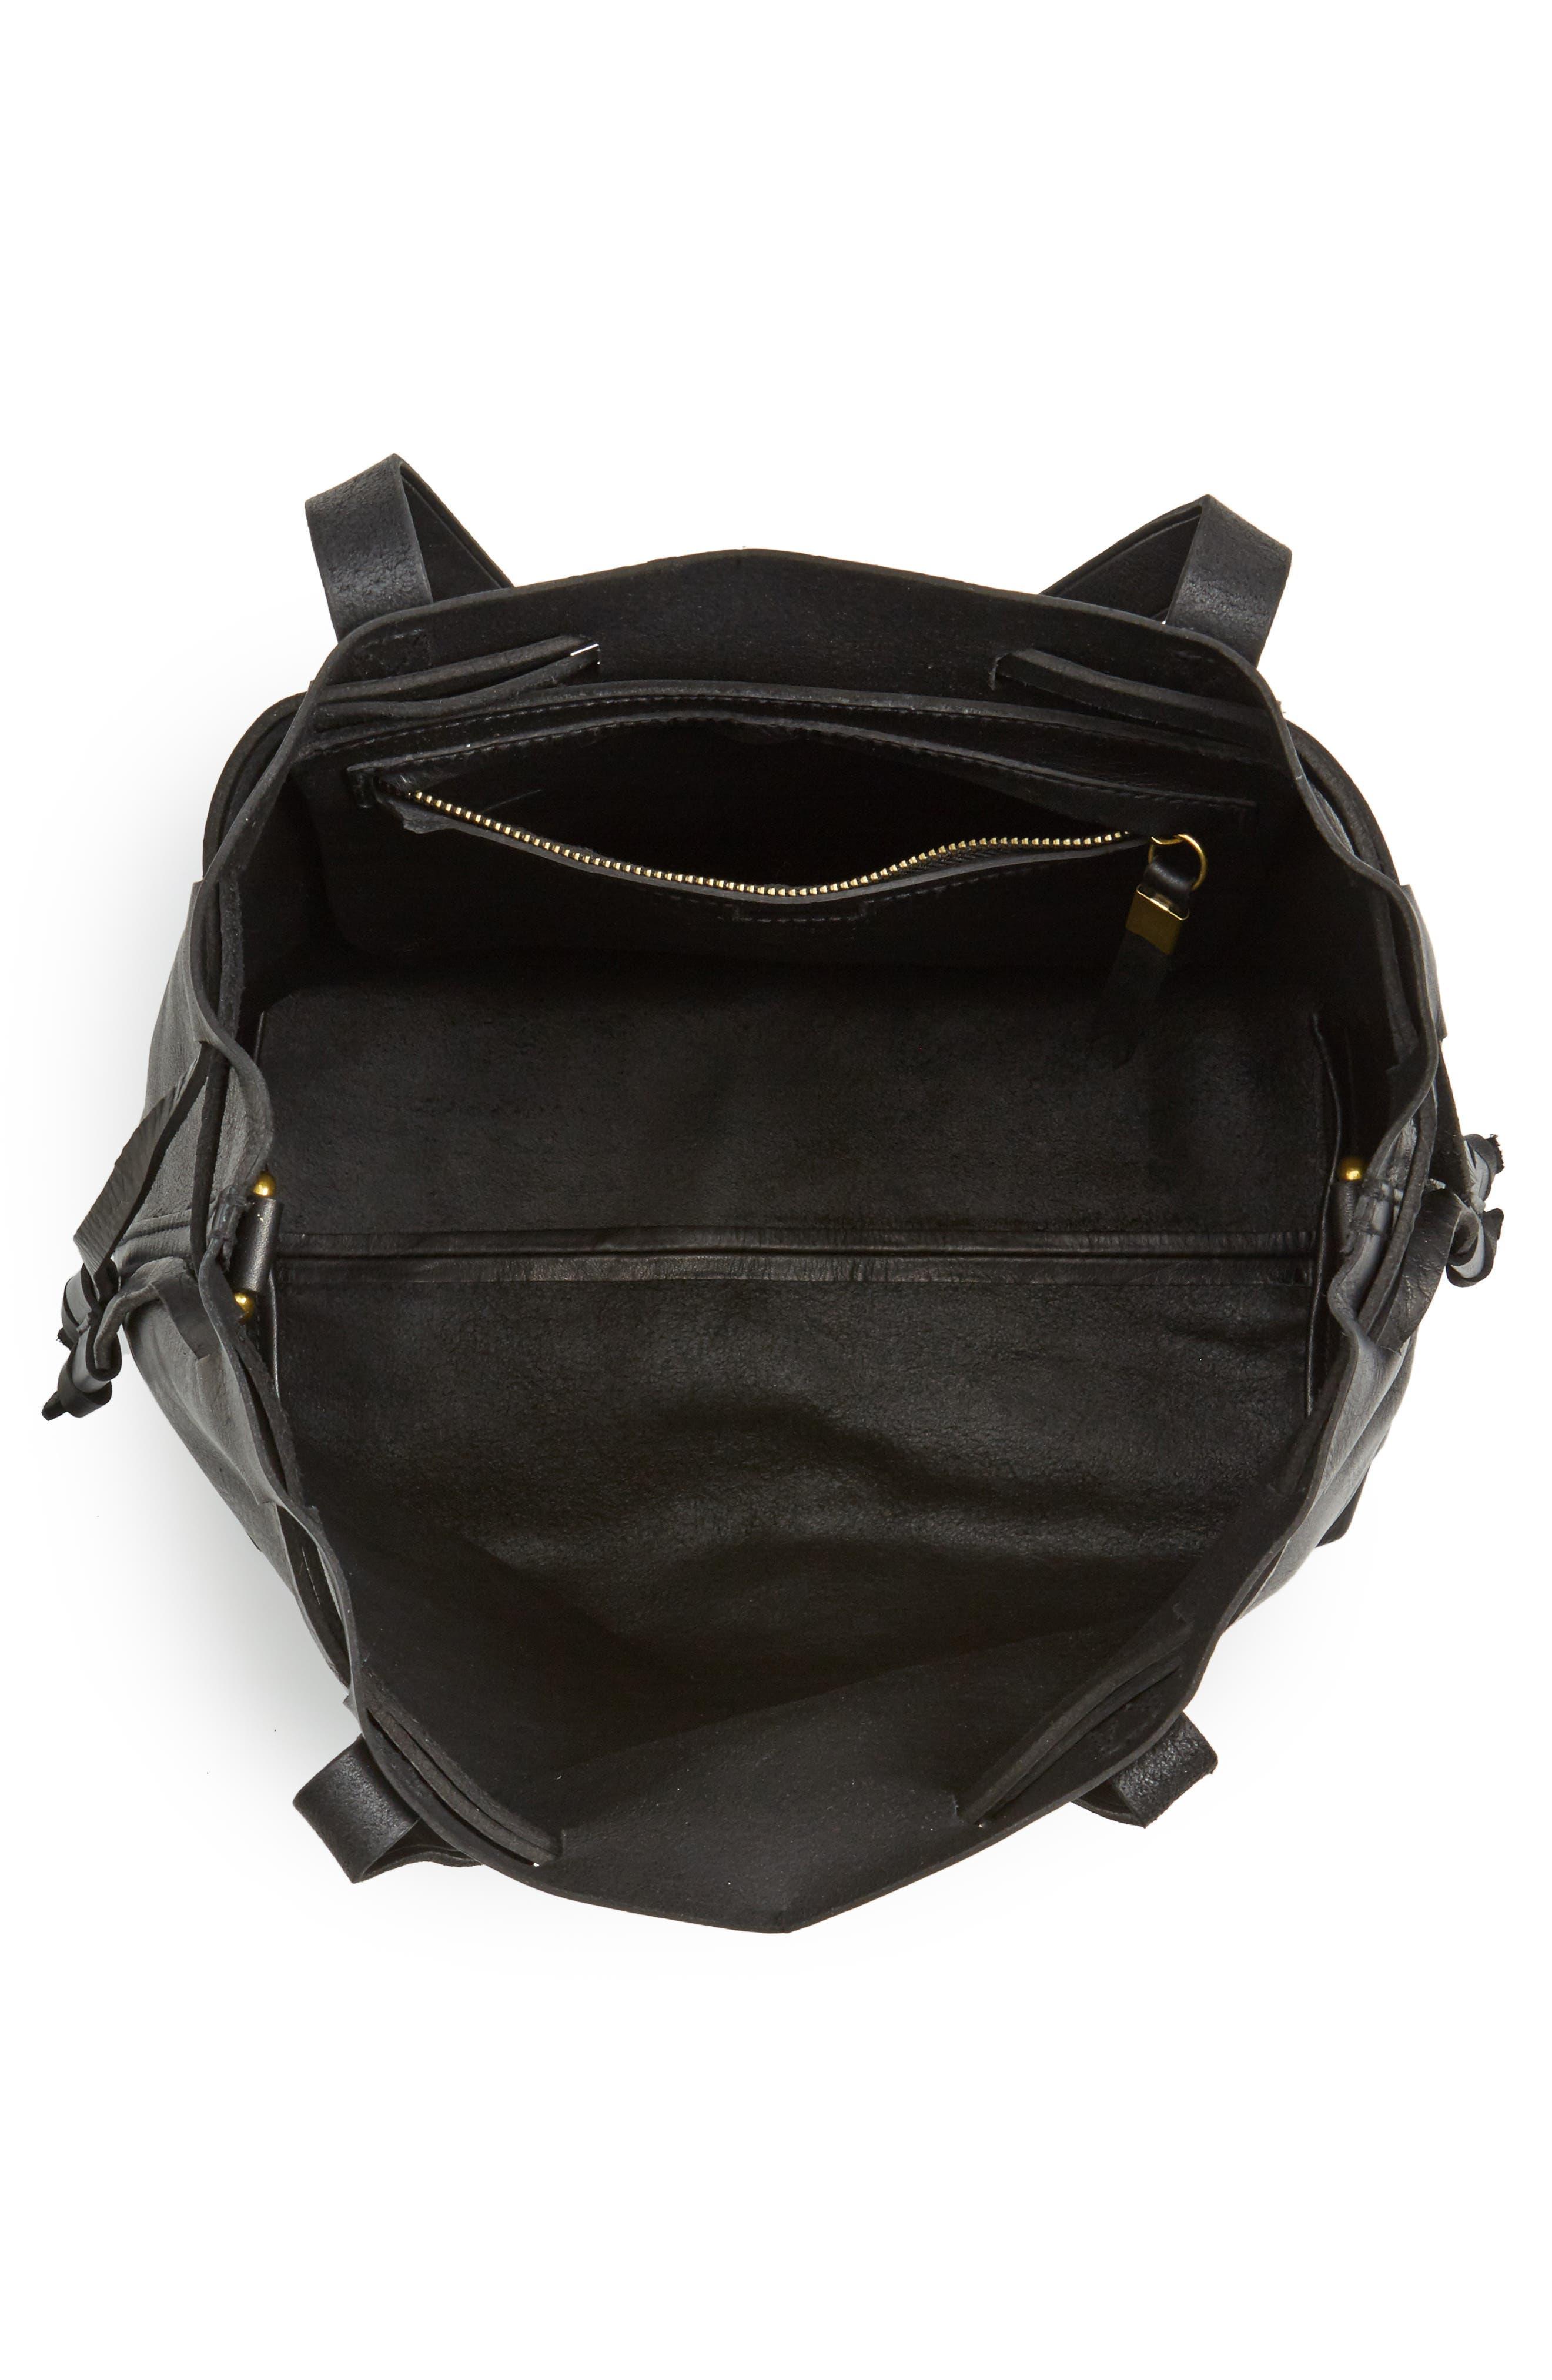 Medium Drawstring Transport Leather Tote,                             Alternate thumbnail 4, color,                             TRUE BLACK